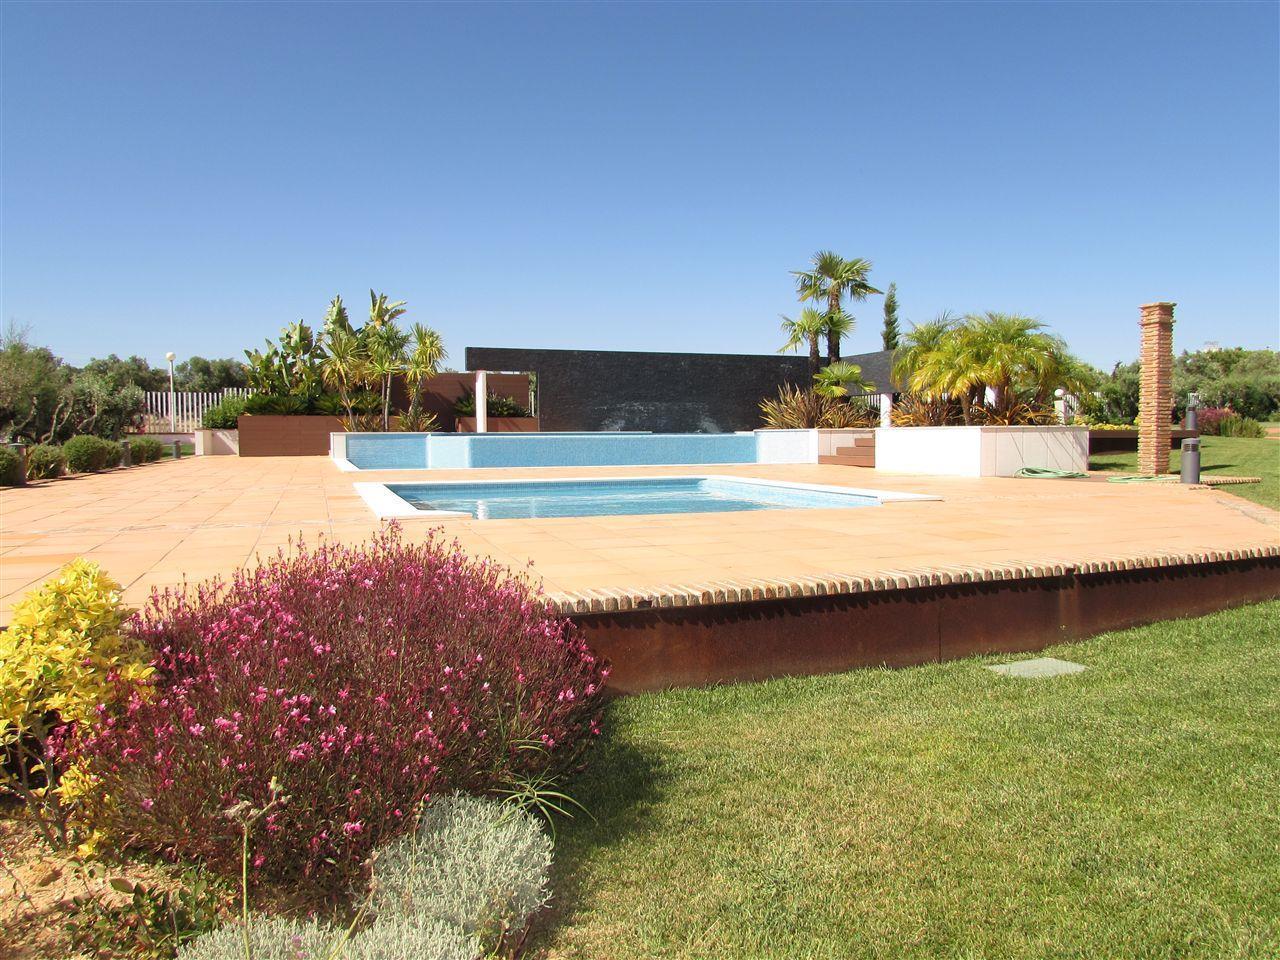 Moradia para Venda às Terraced house, 5 bedrooms, for Sale Loule, Algarve Portugal